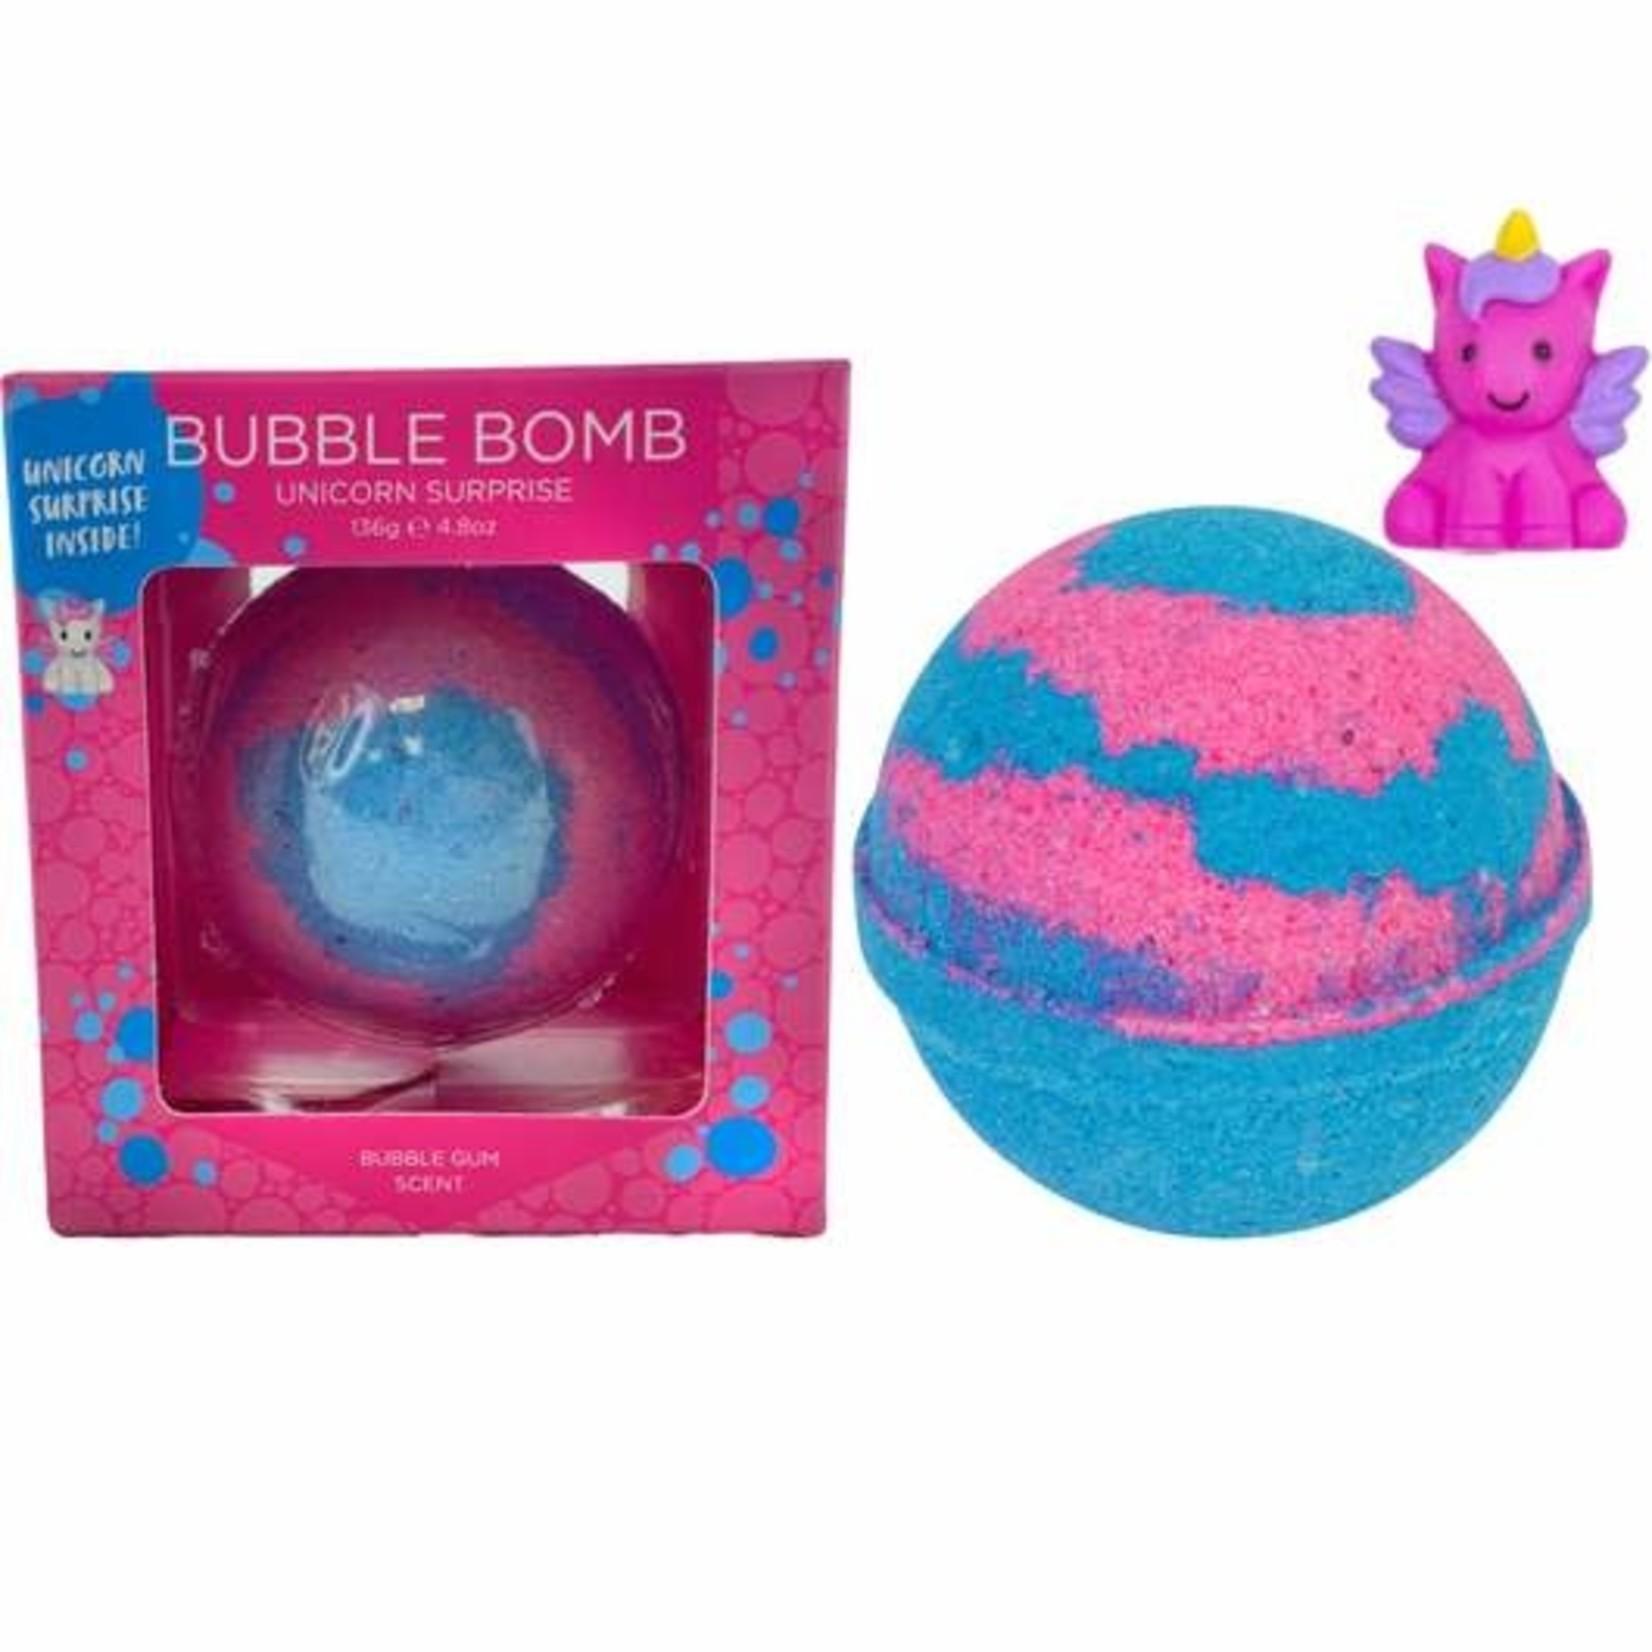 Bath Bomb - Unicorn Squish Toy